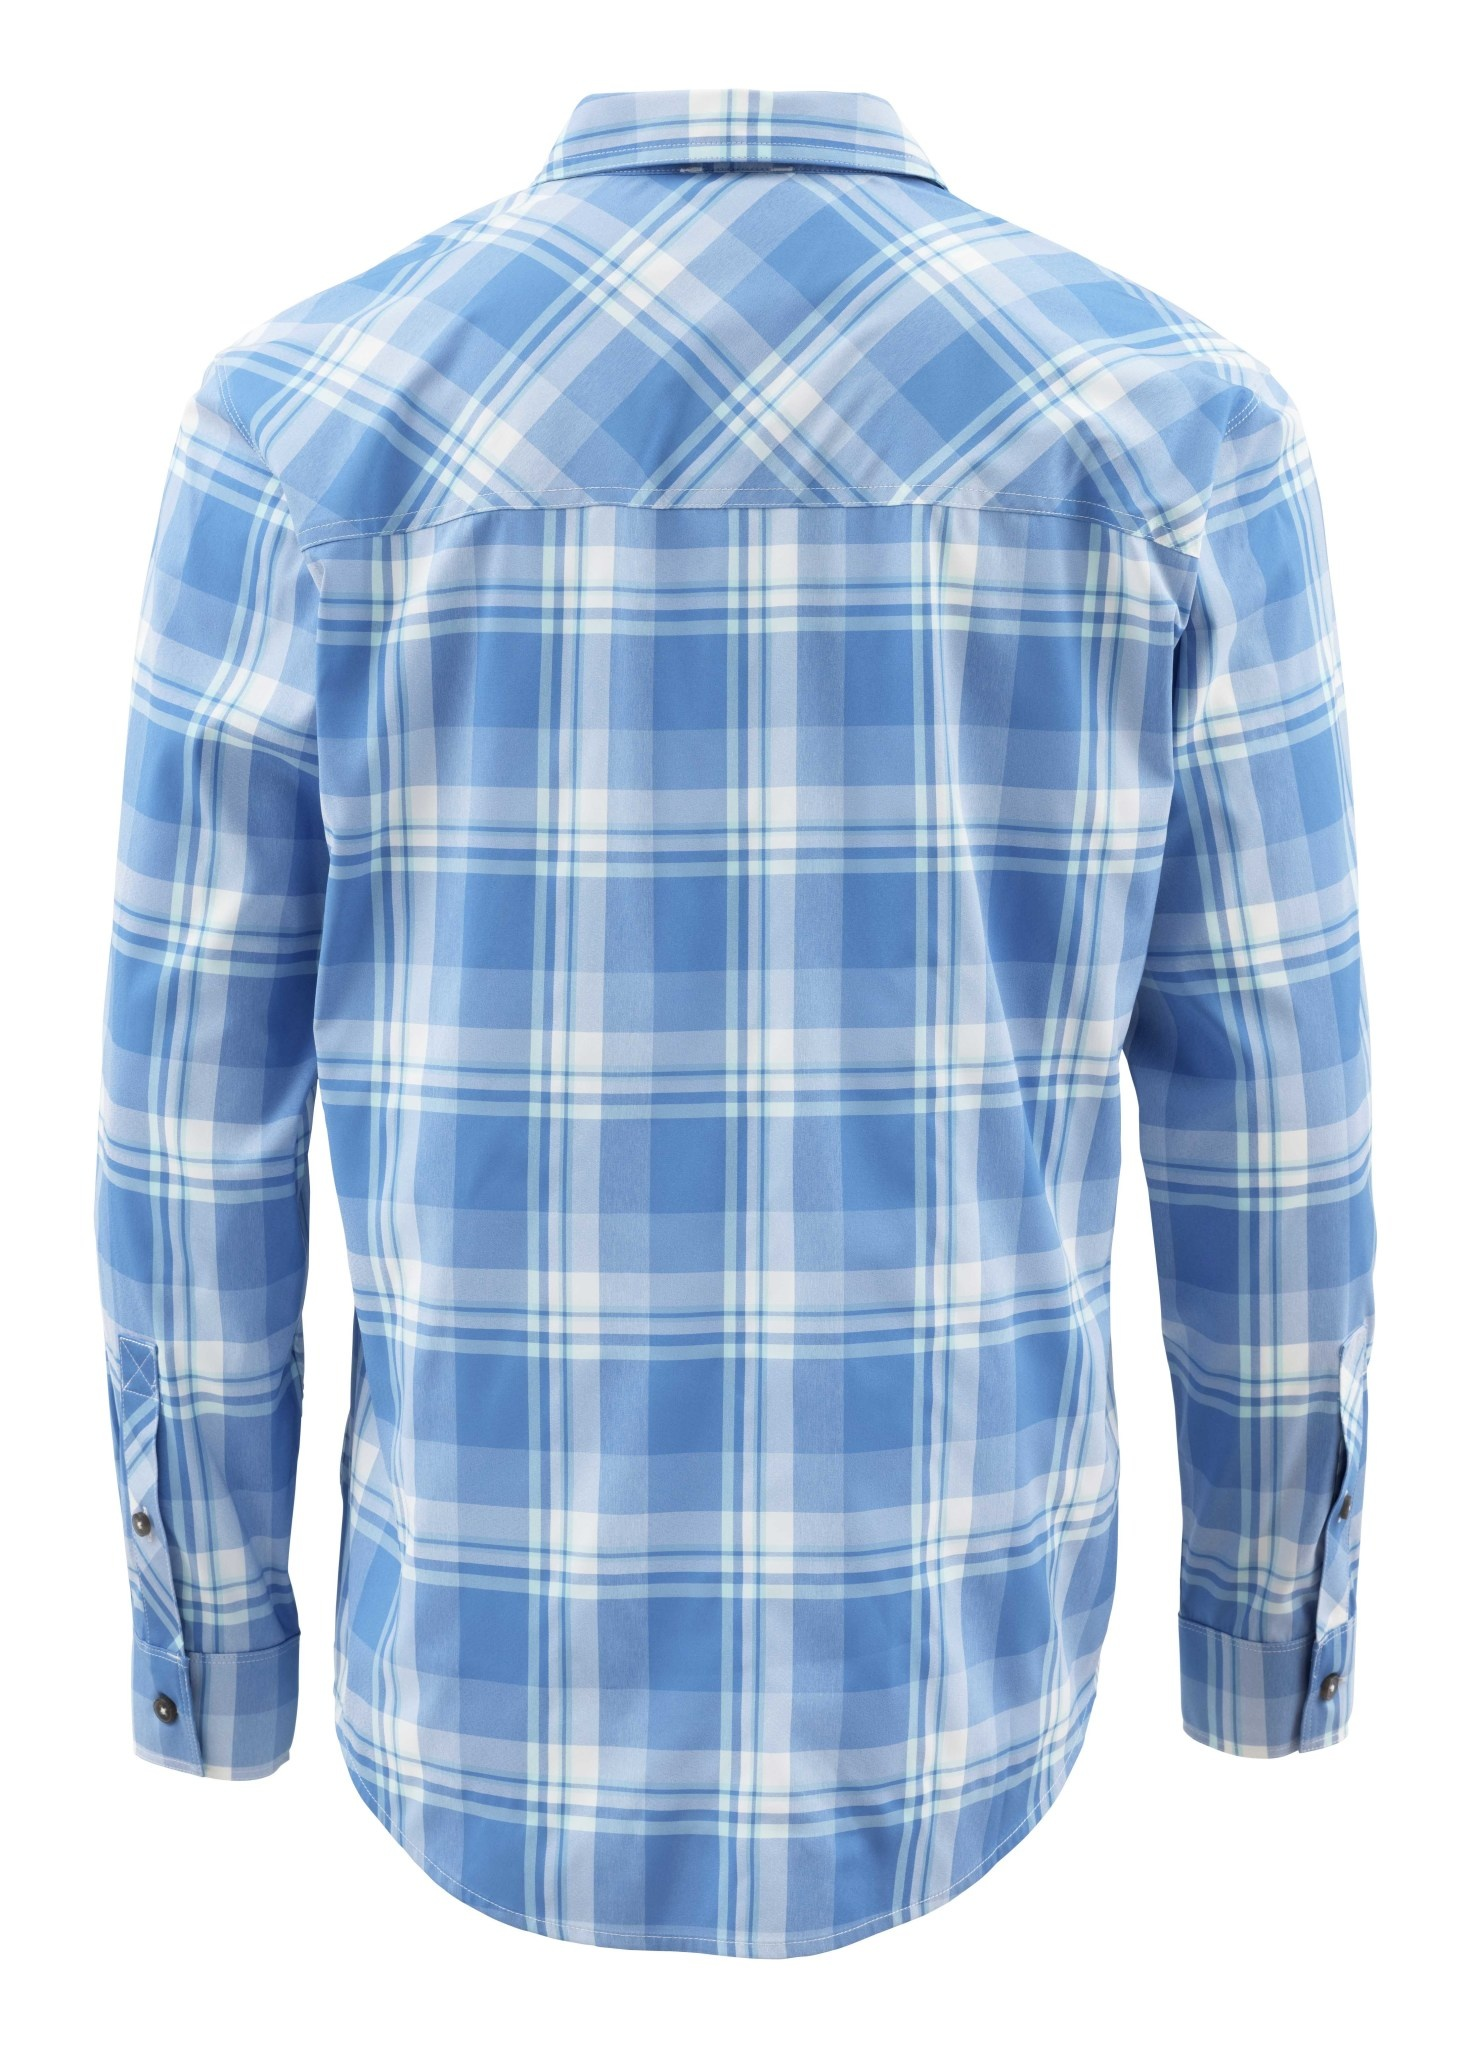 Simms Simms Outpost Shirt